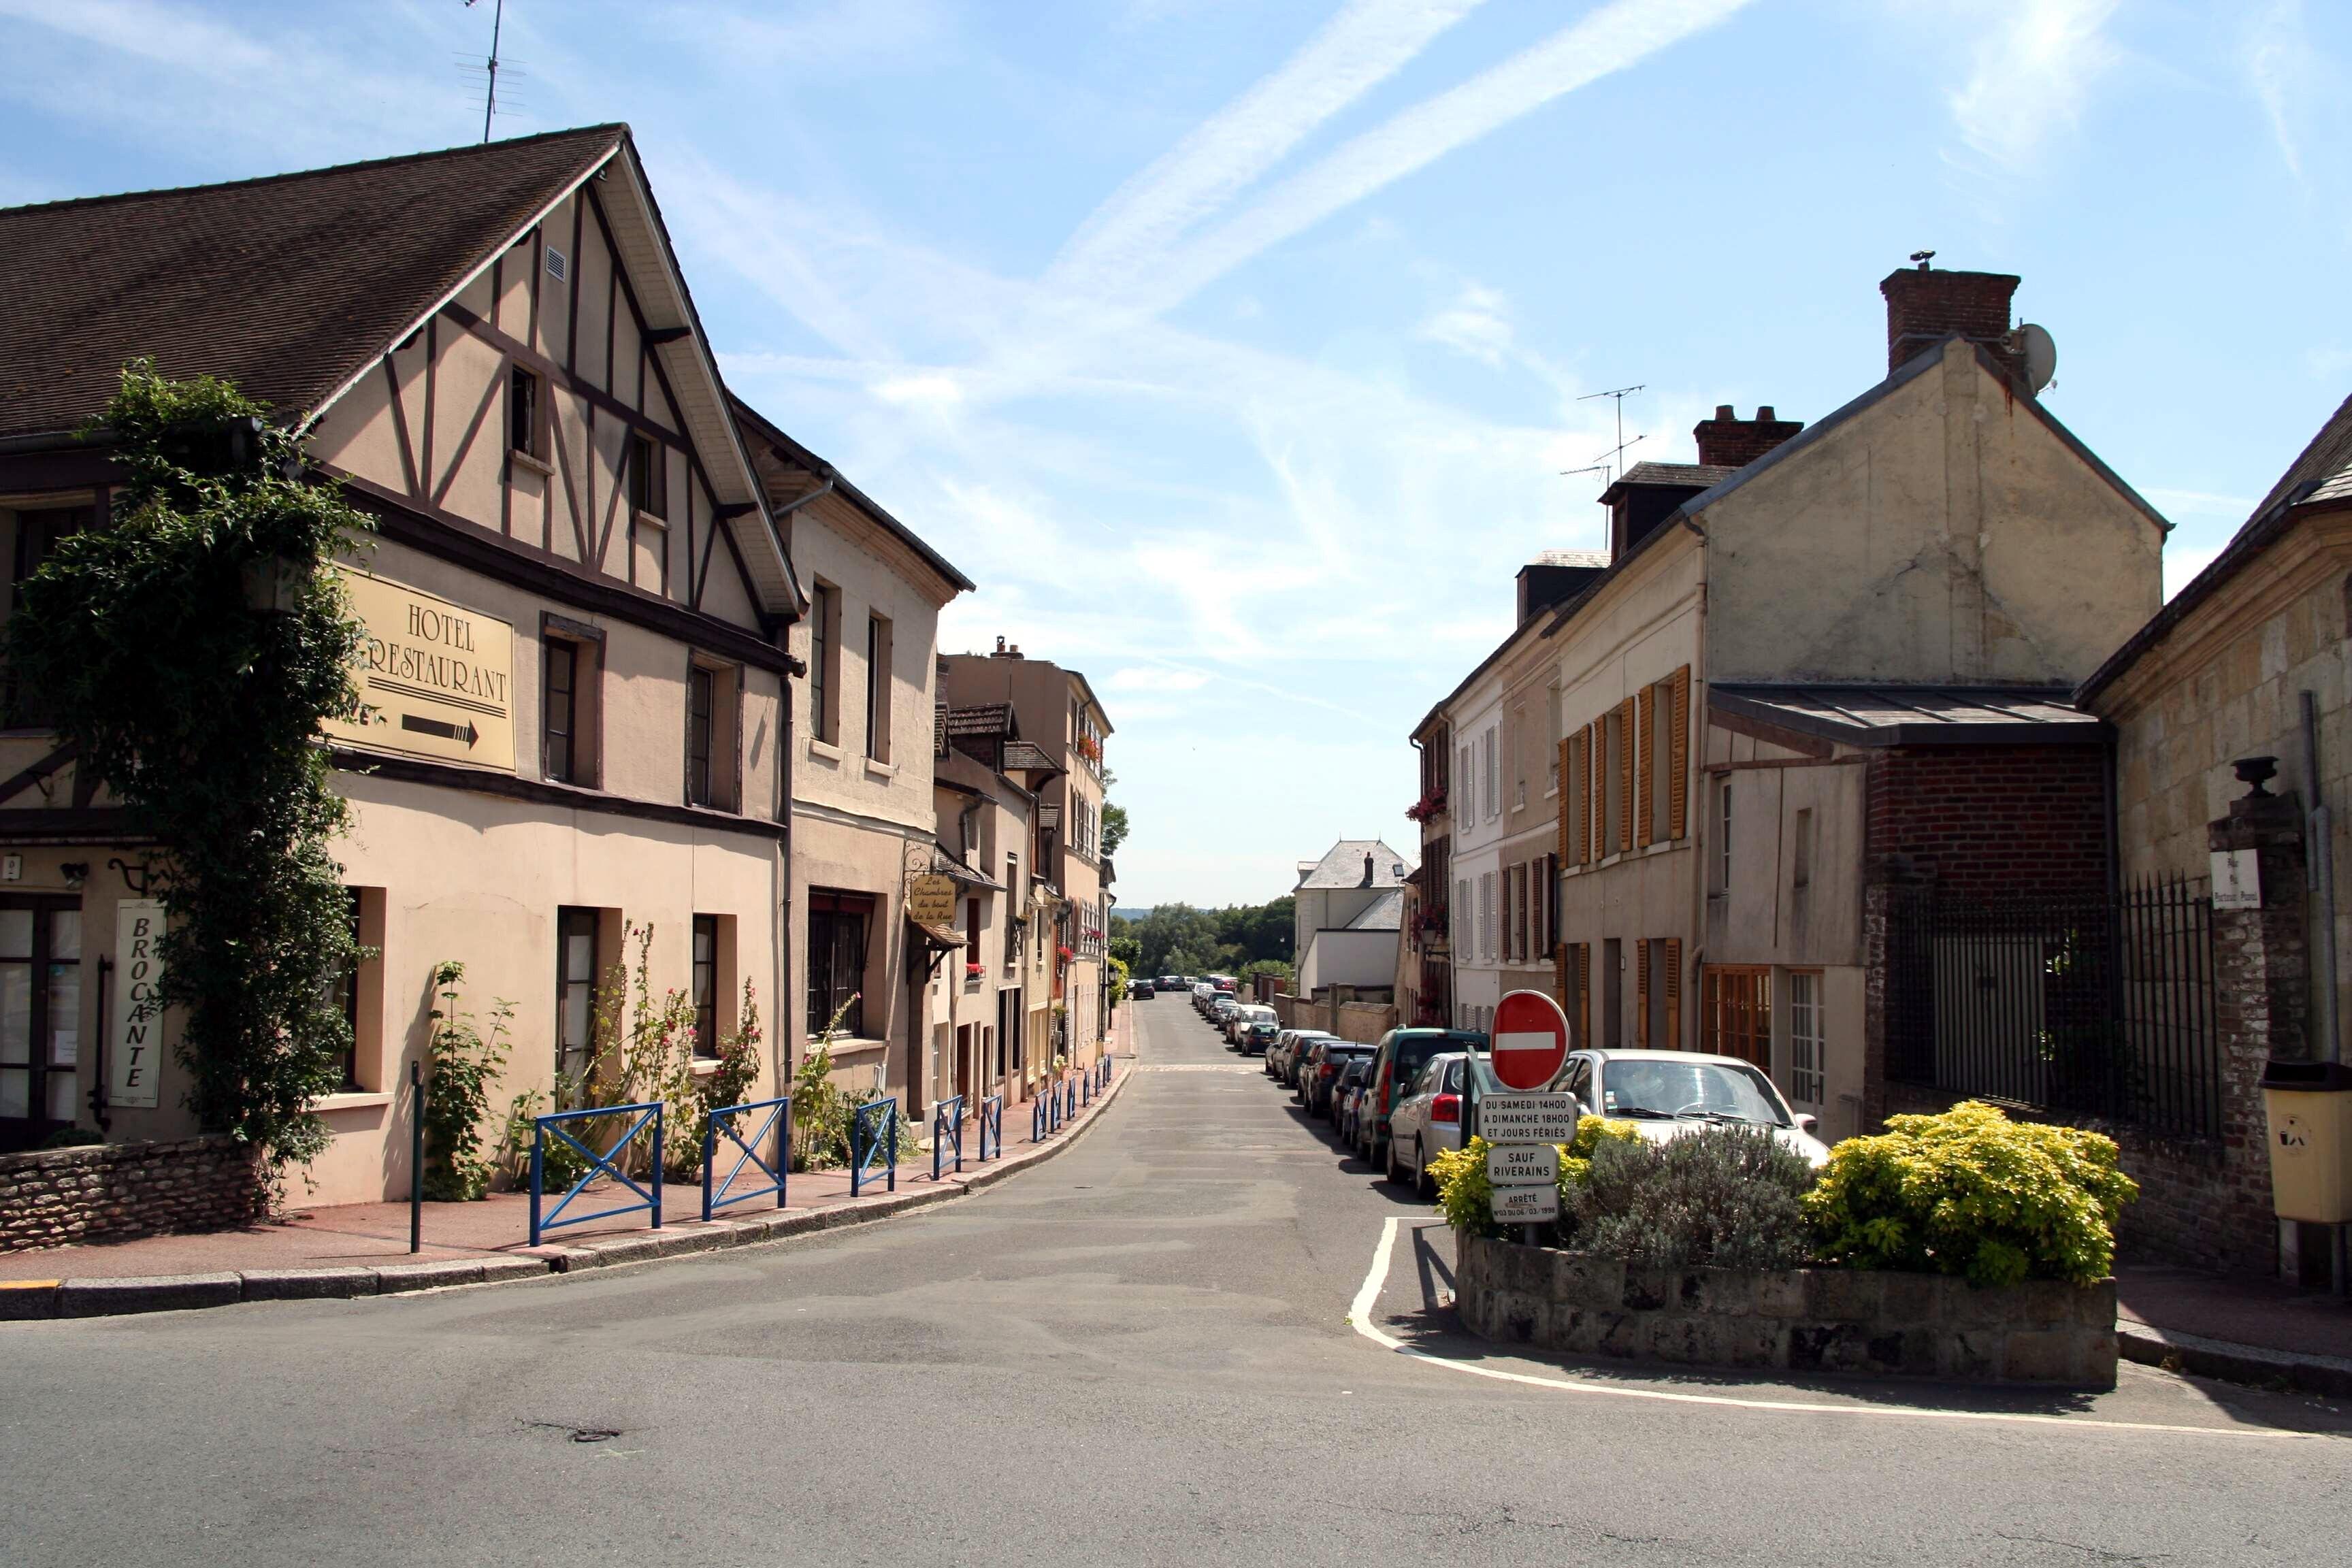 Restaurant La Petite Fontaine Place De La R Ef Bf Bdpublique Collobri Ef Bf Bdres Perancis